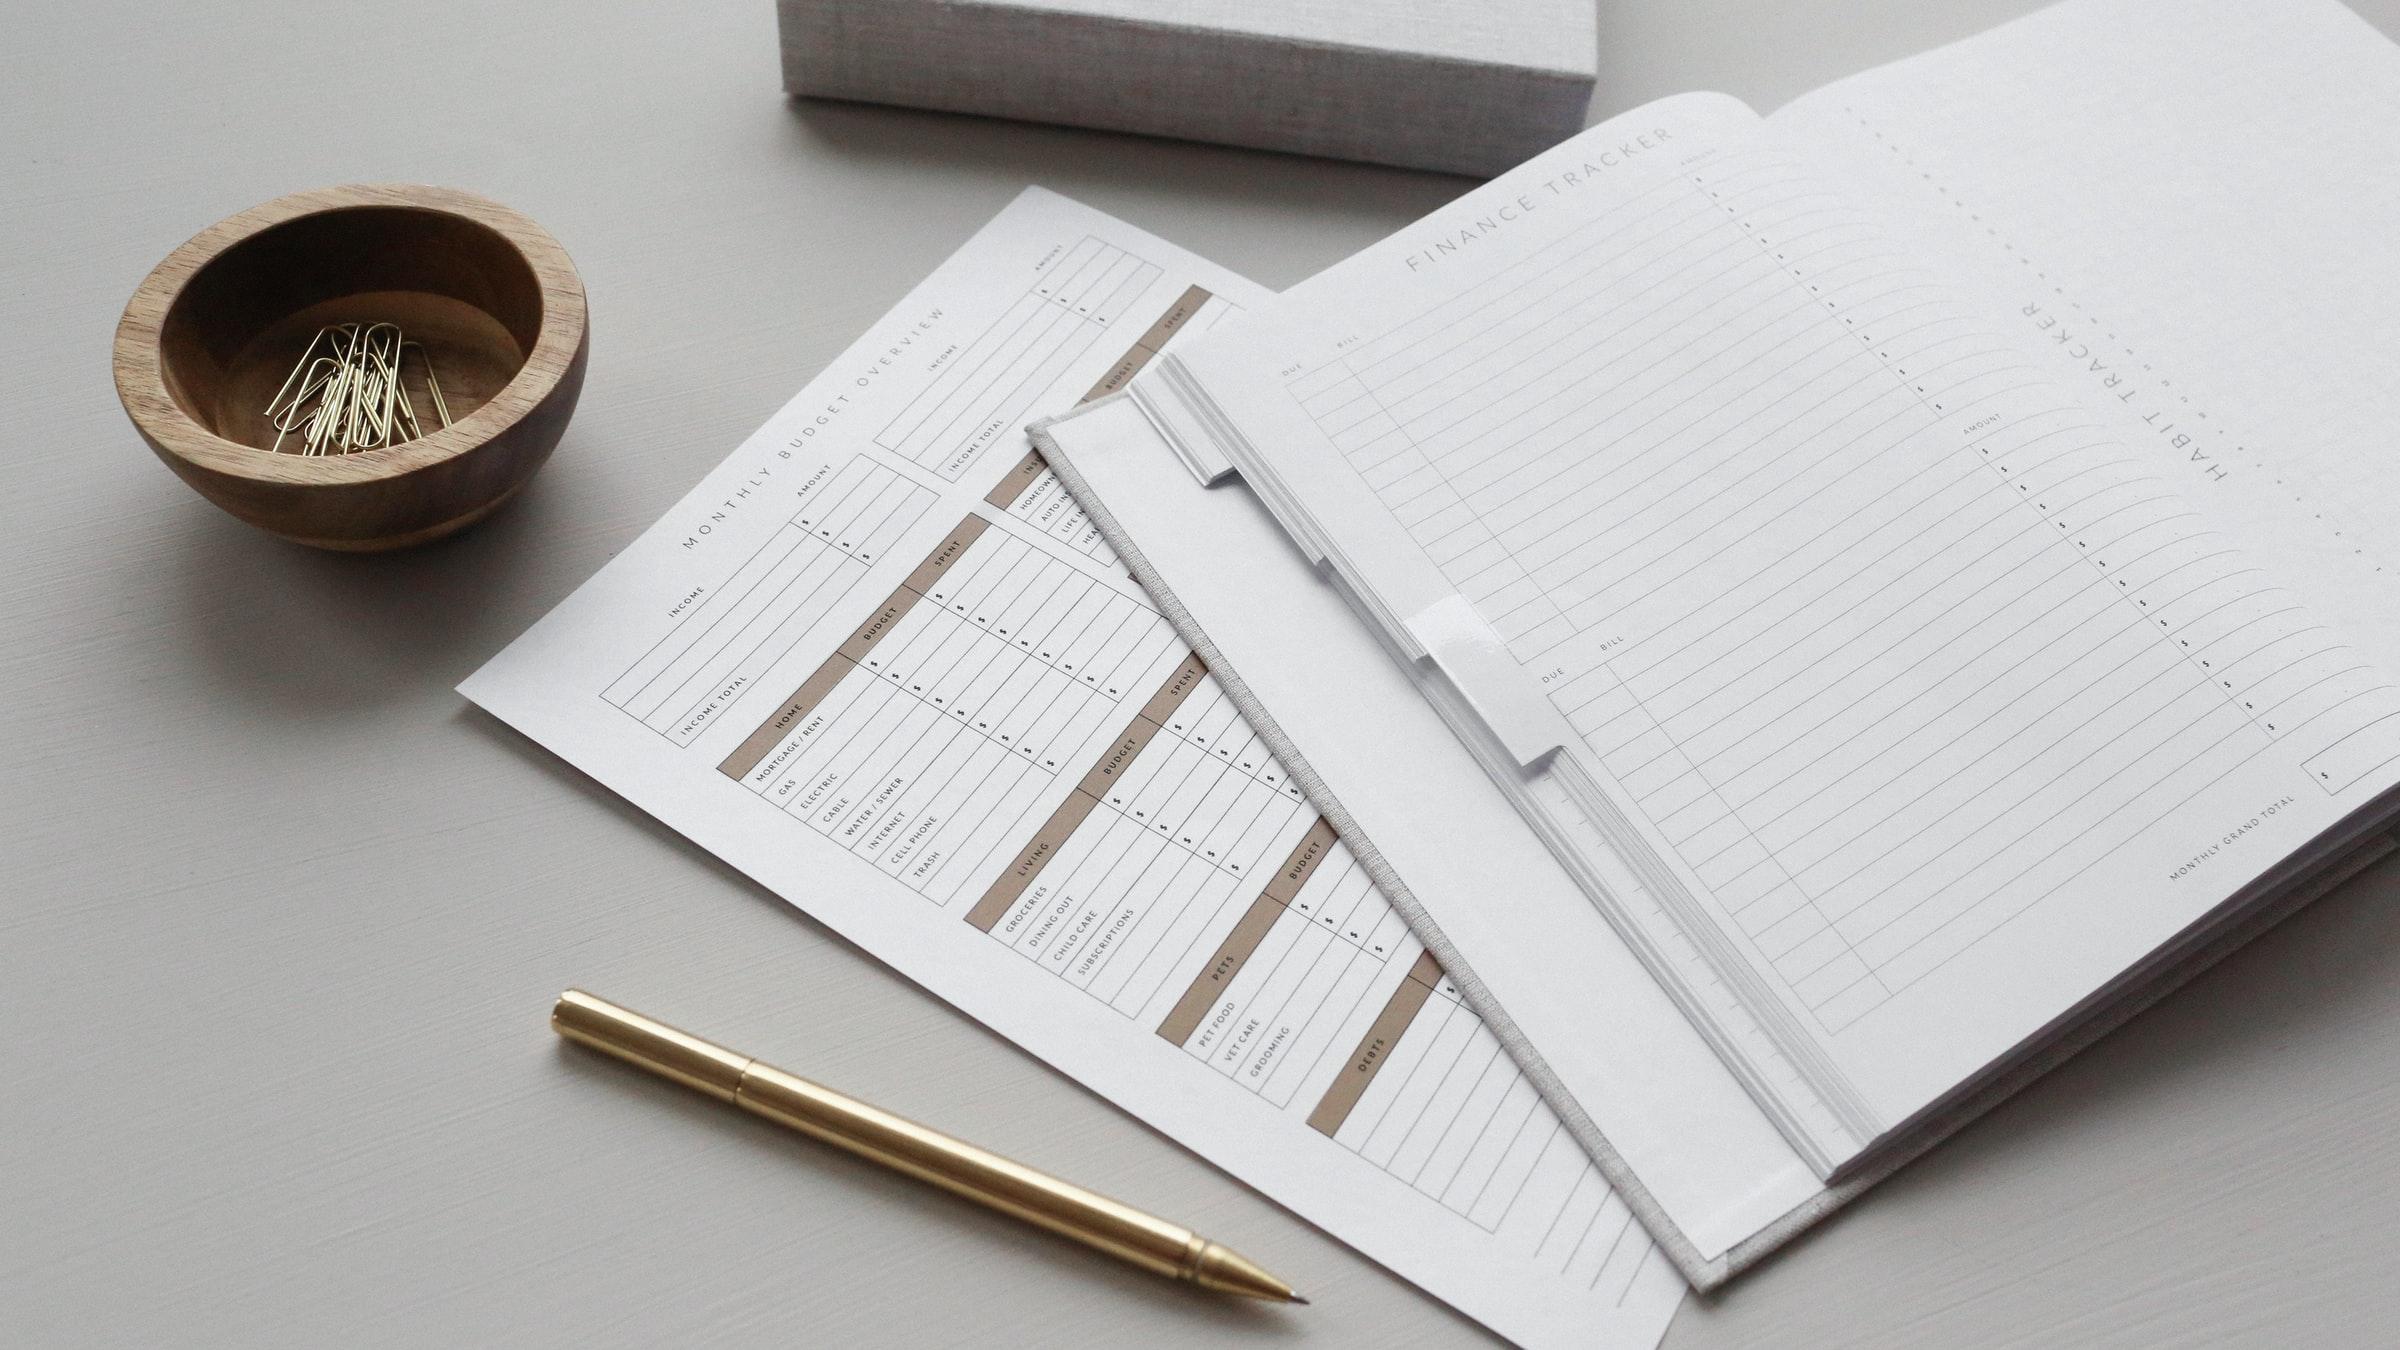 A blank finance tracker and budget sheet